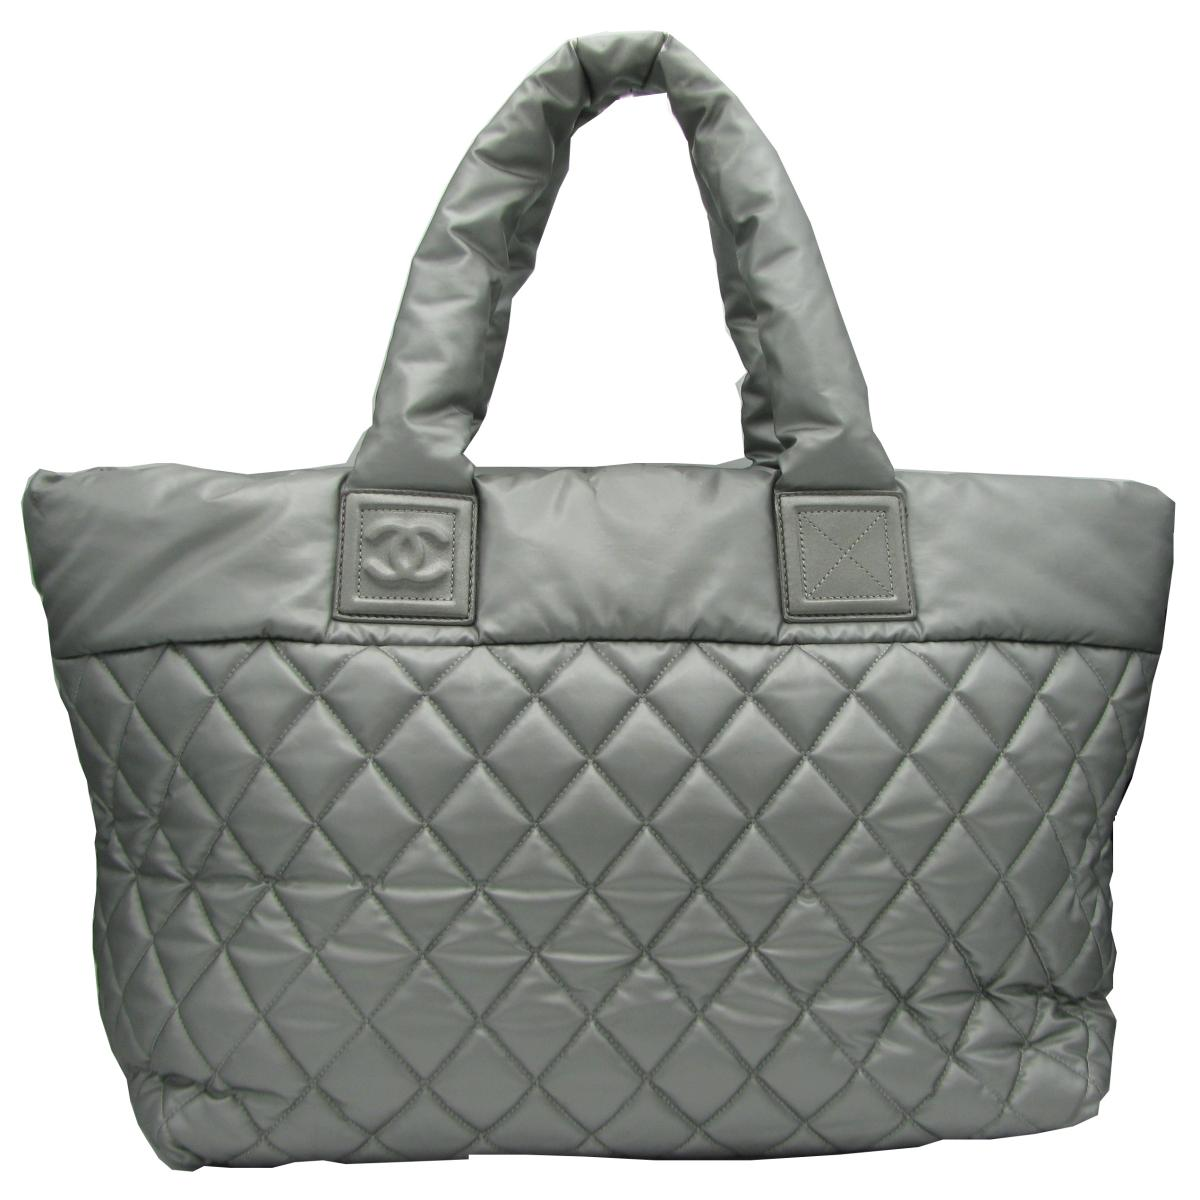 CHANEL nylon bag CHANEL() ()C